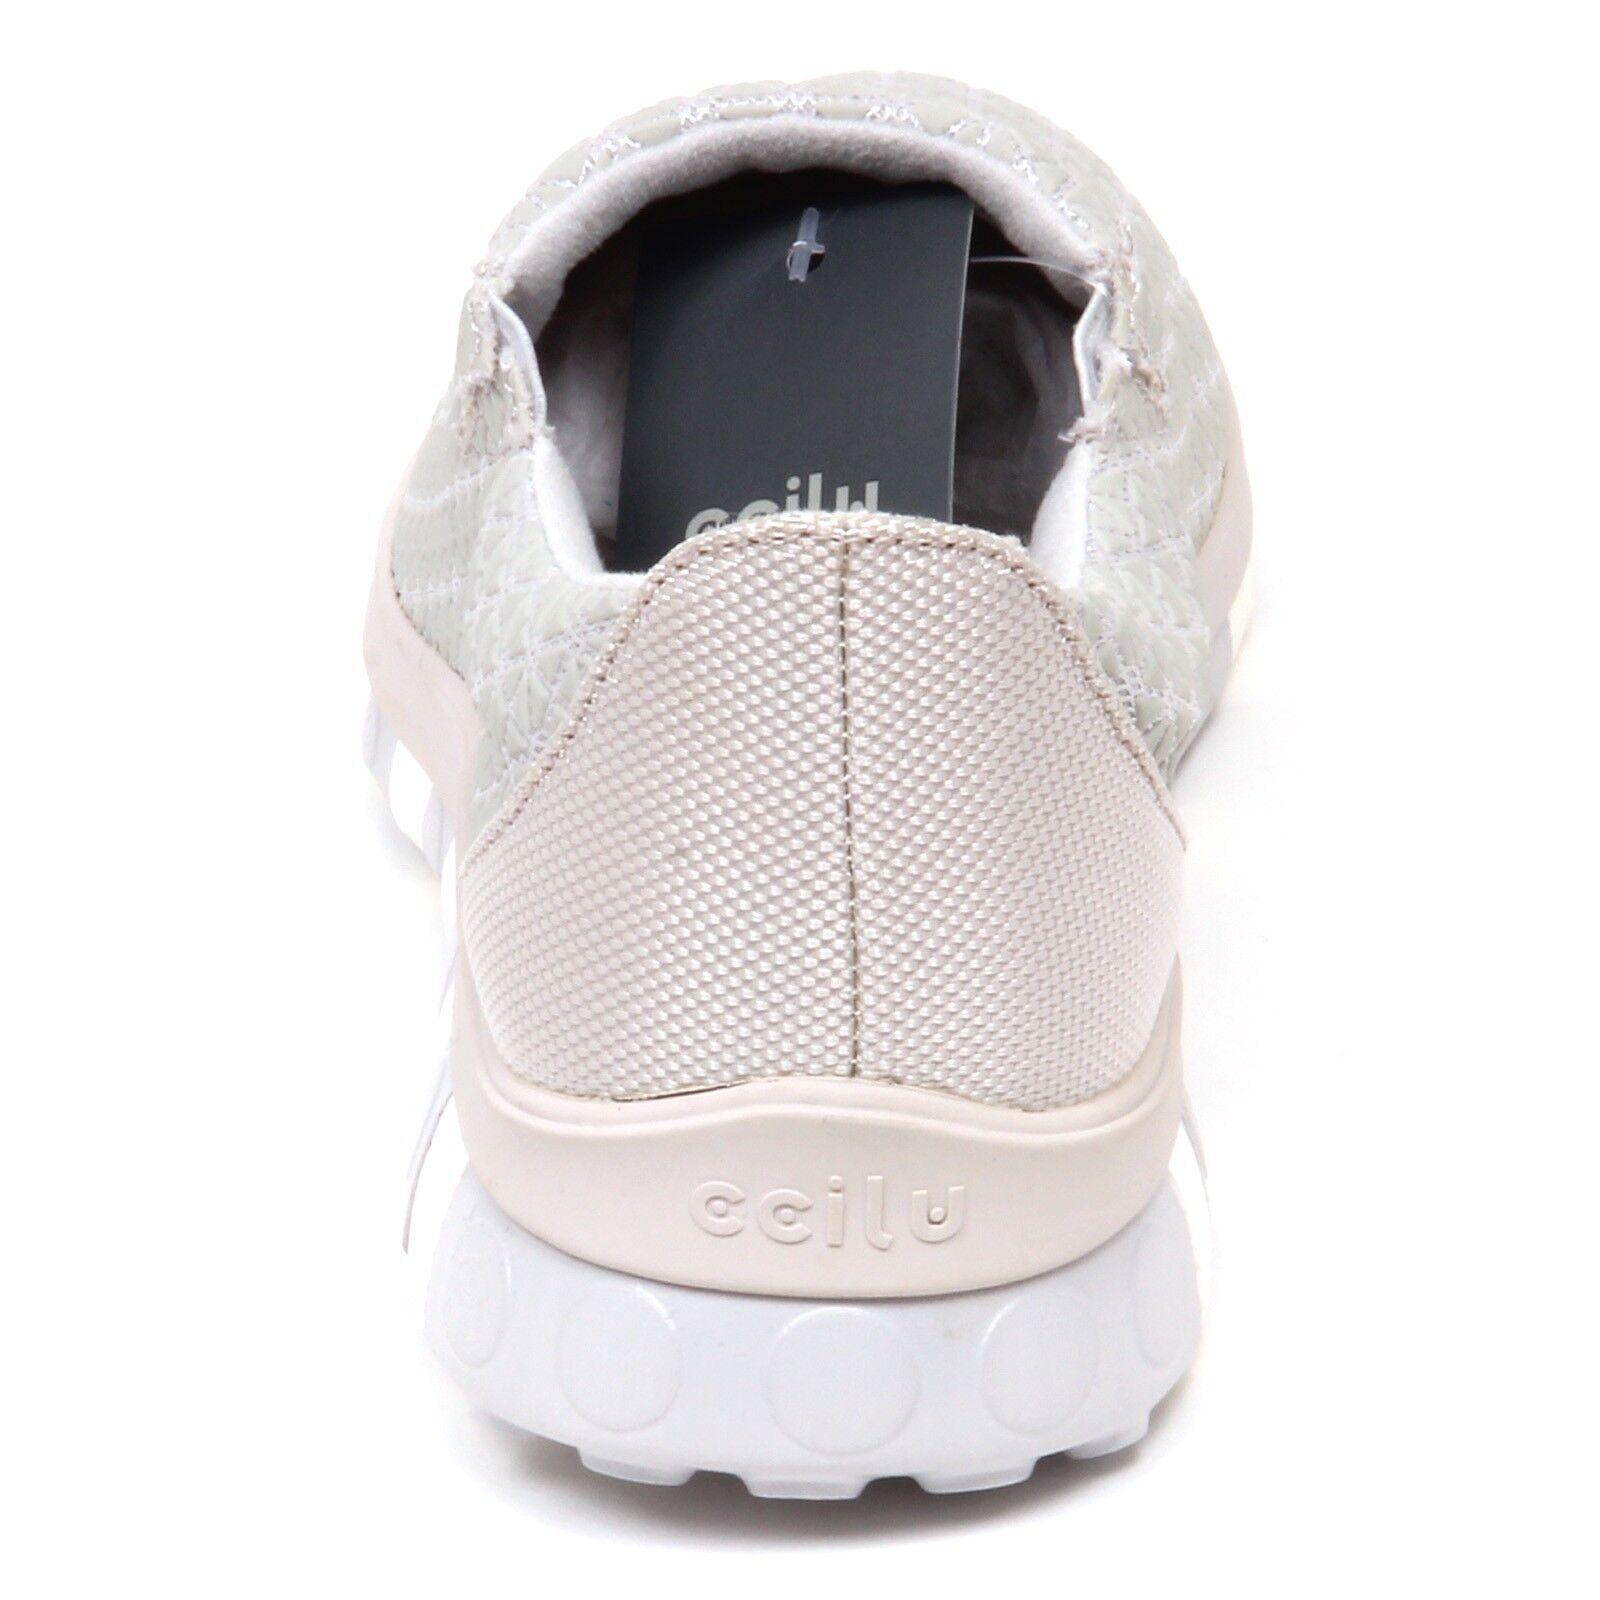 E8032 (WITHOUT BOX) sneaker uomo tissue/rubber CCILU grey slip on shoe shoe on man 4185e2